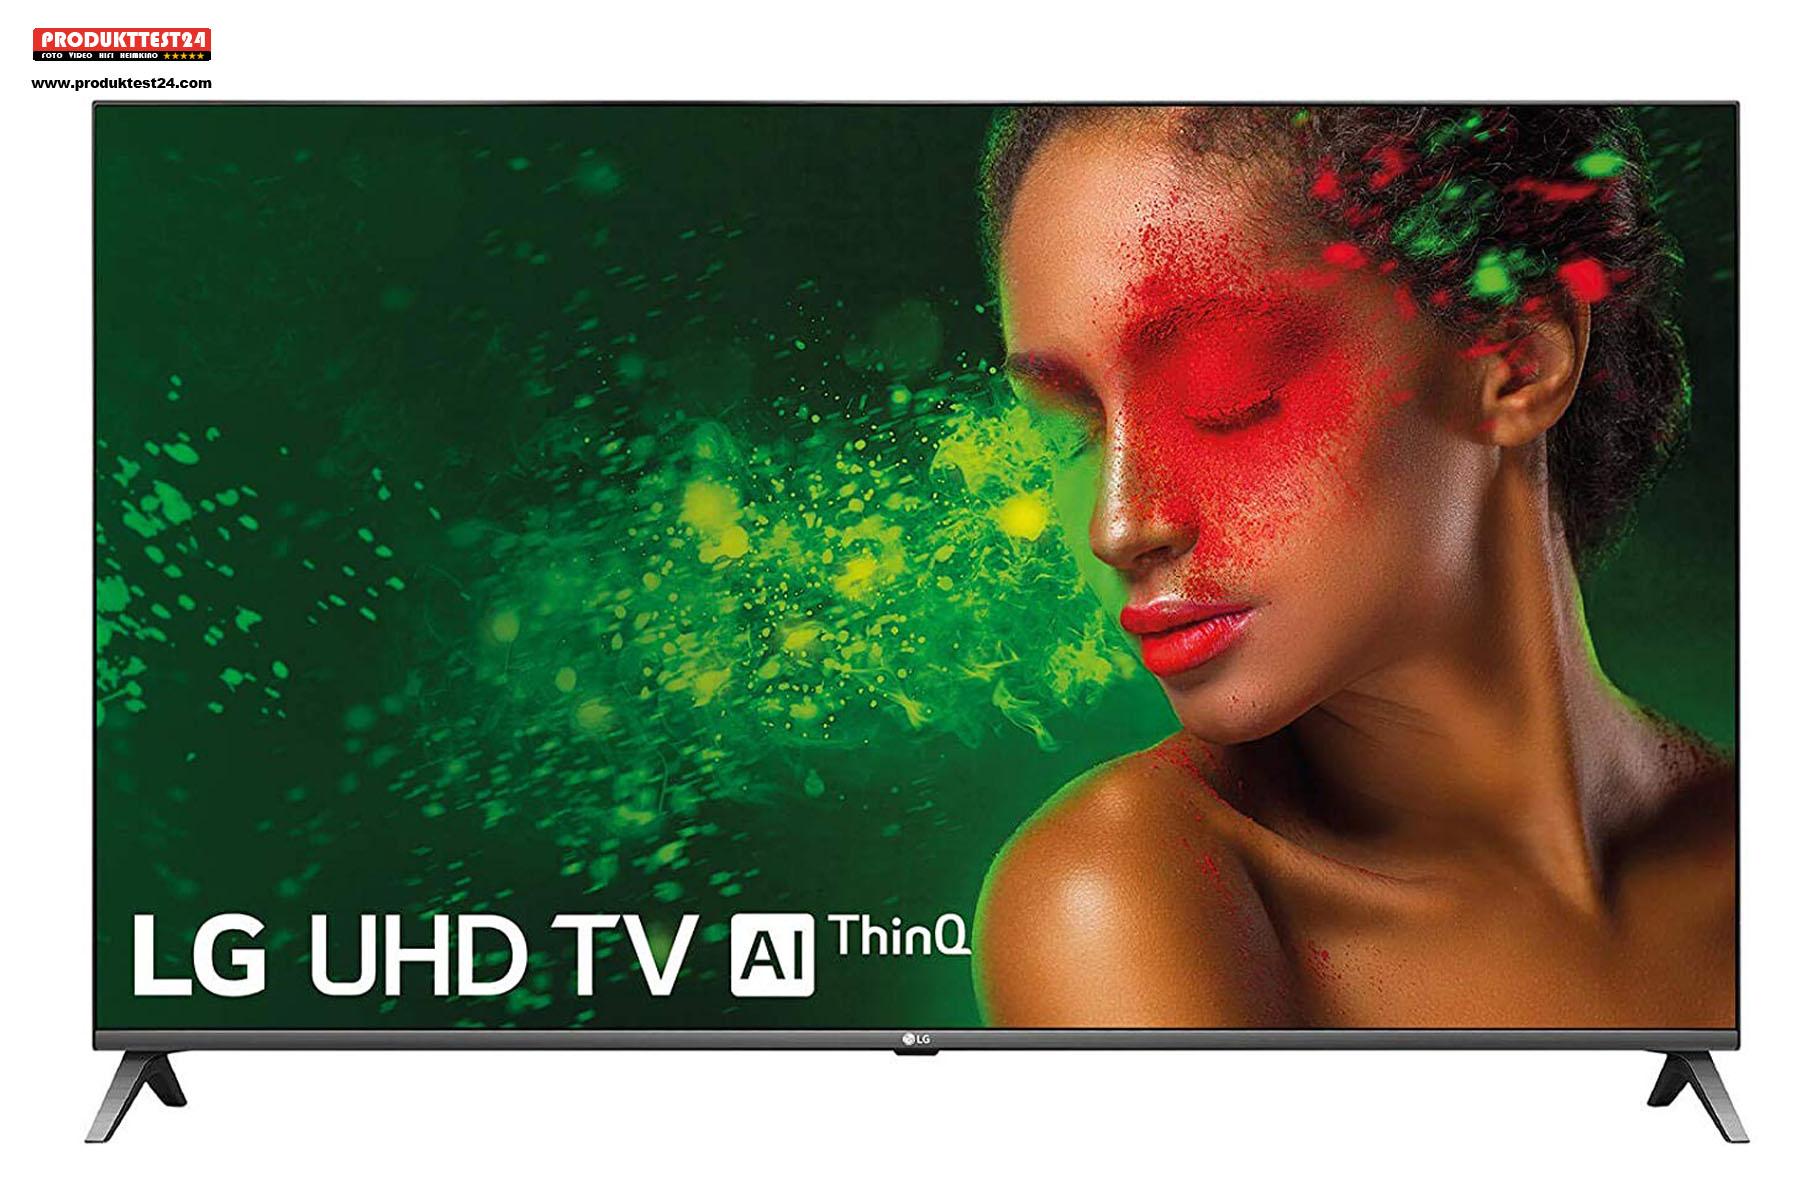 LG 55UM7510 UHD 4K-Fernseher mit 139 cm Bilddiagonale